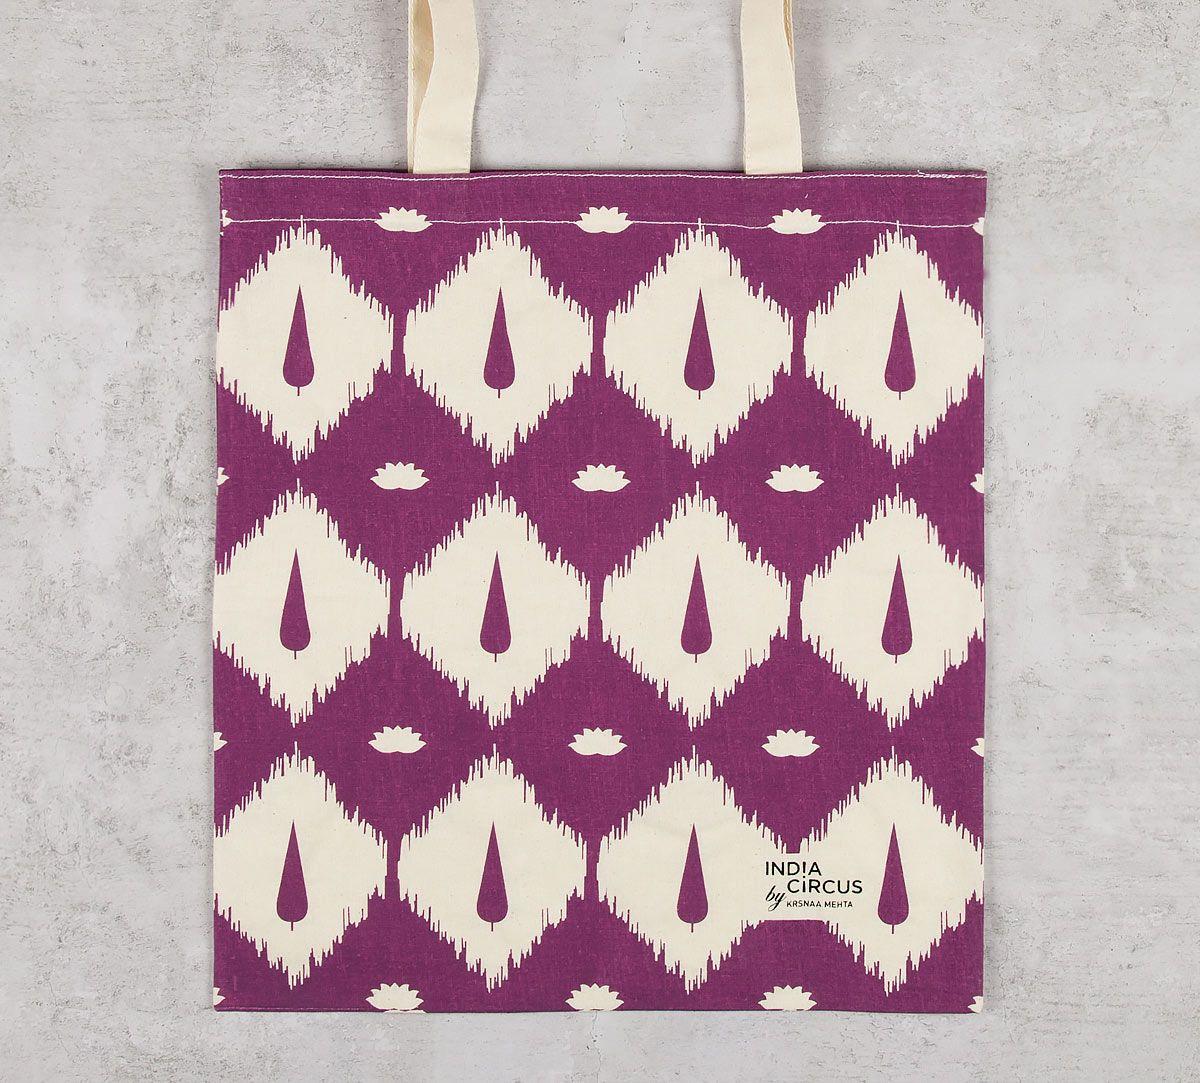 India Circus Conifer Symmetry Jhola Bag